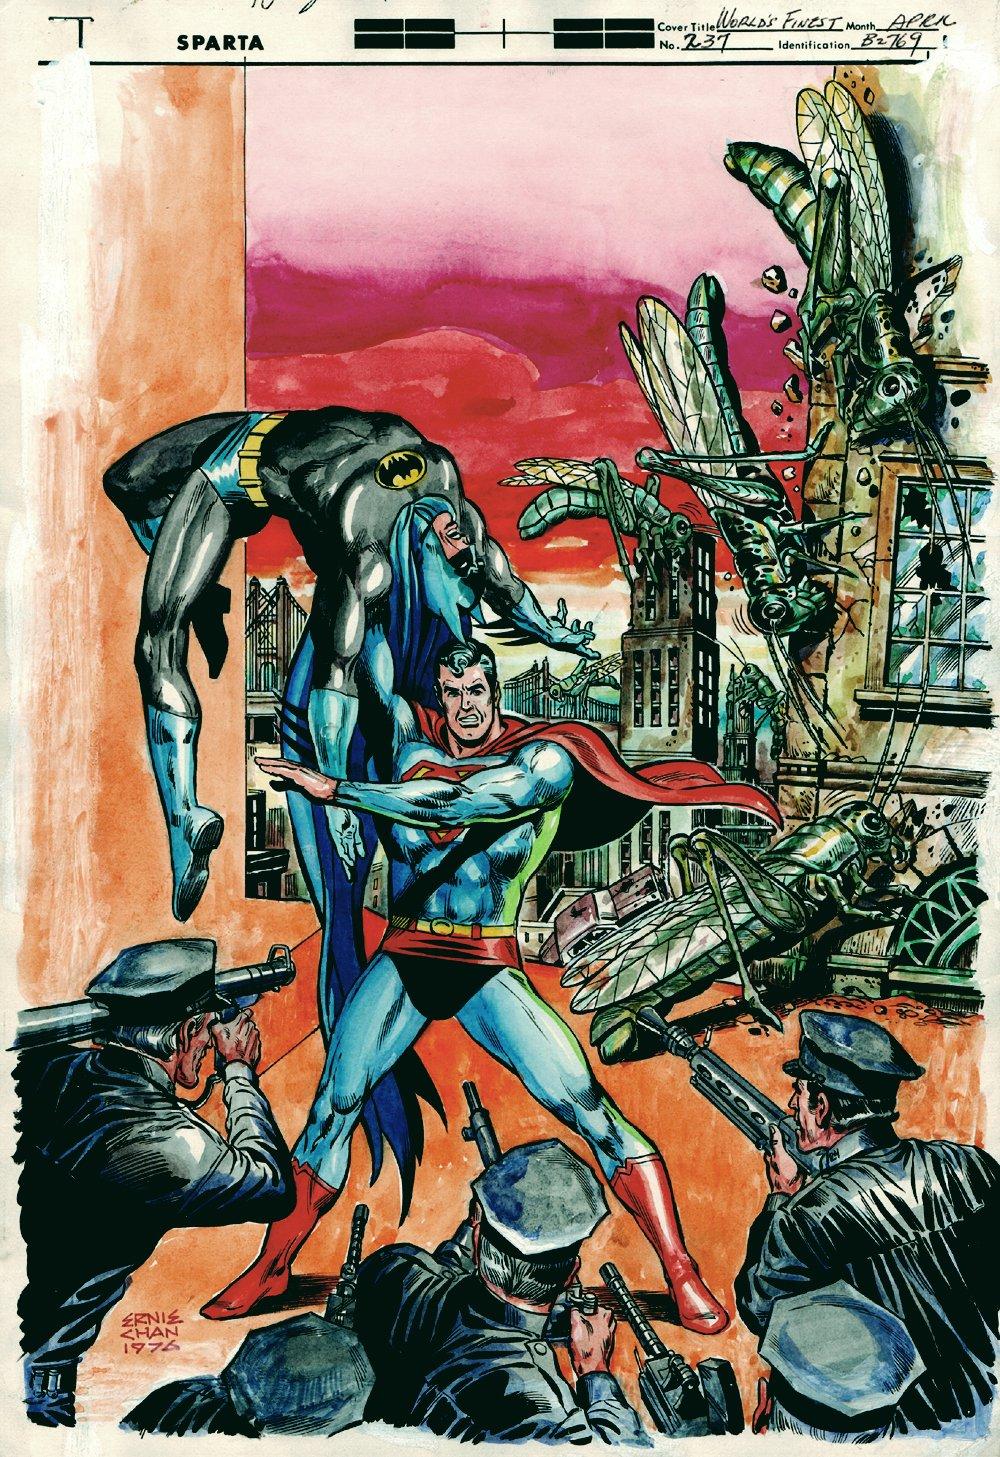 World's Finest Comics #237 Cover (1975)